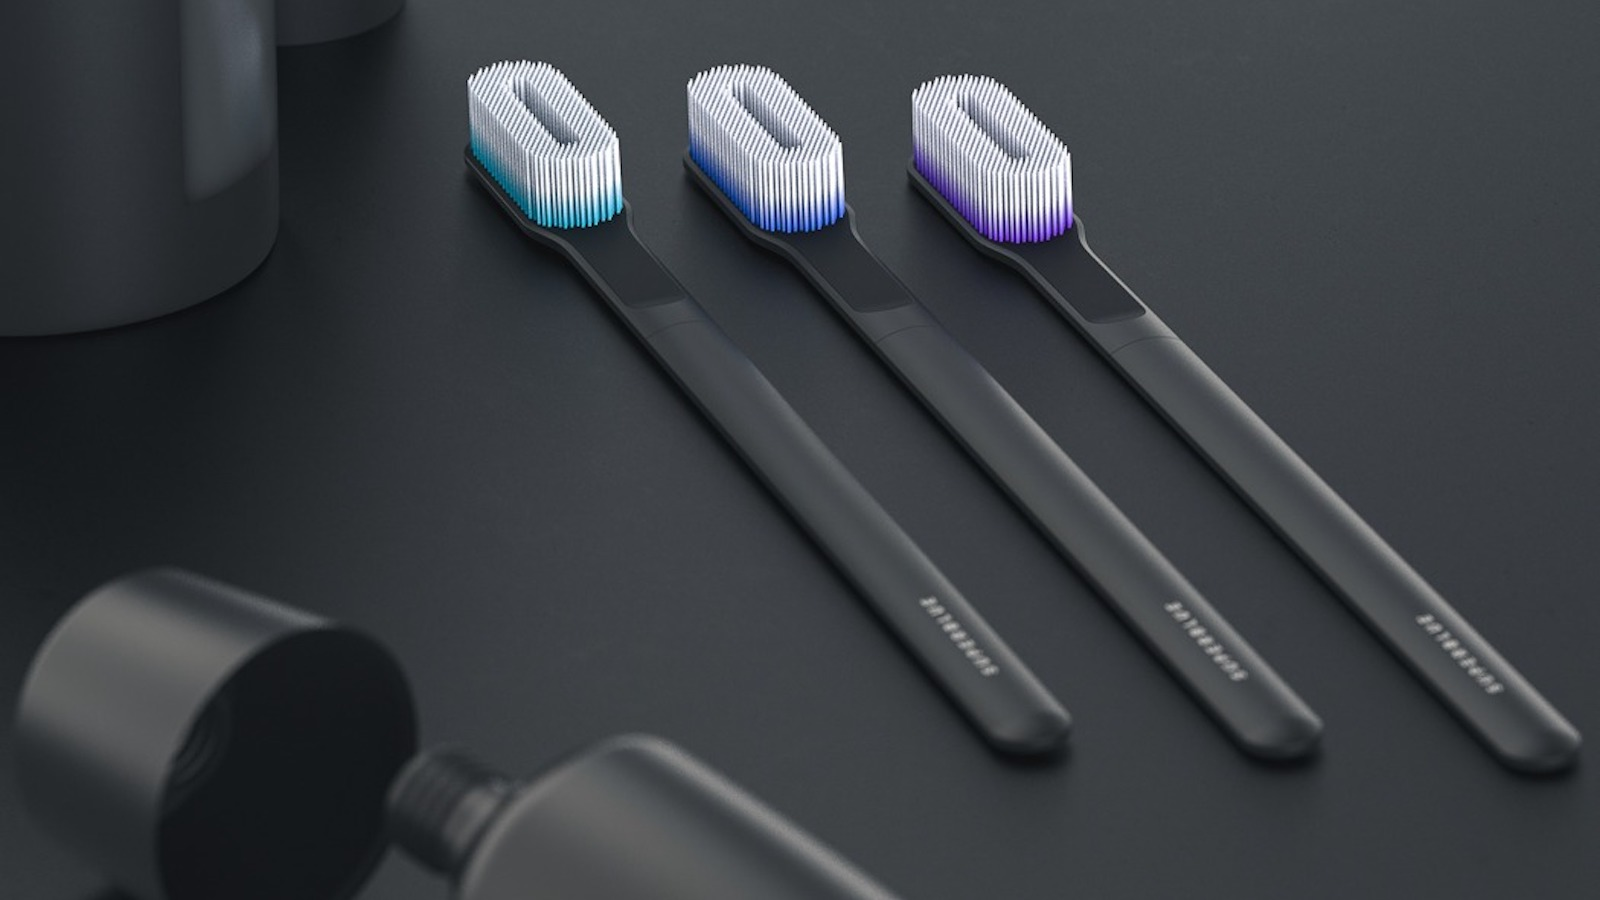 SuperBlue Toothbrush by Dylan Fealtman Sanitizing Teeth Cleaner kills 99.8% of bacteria